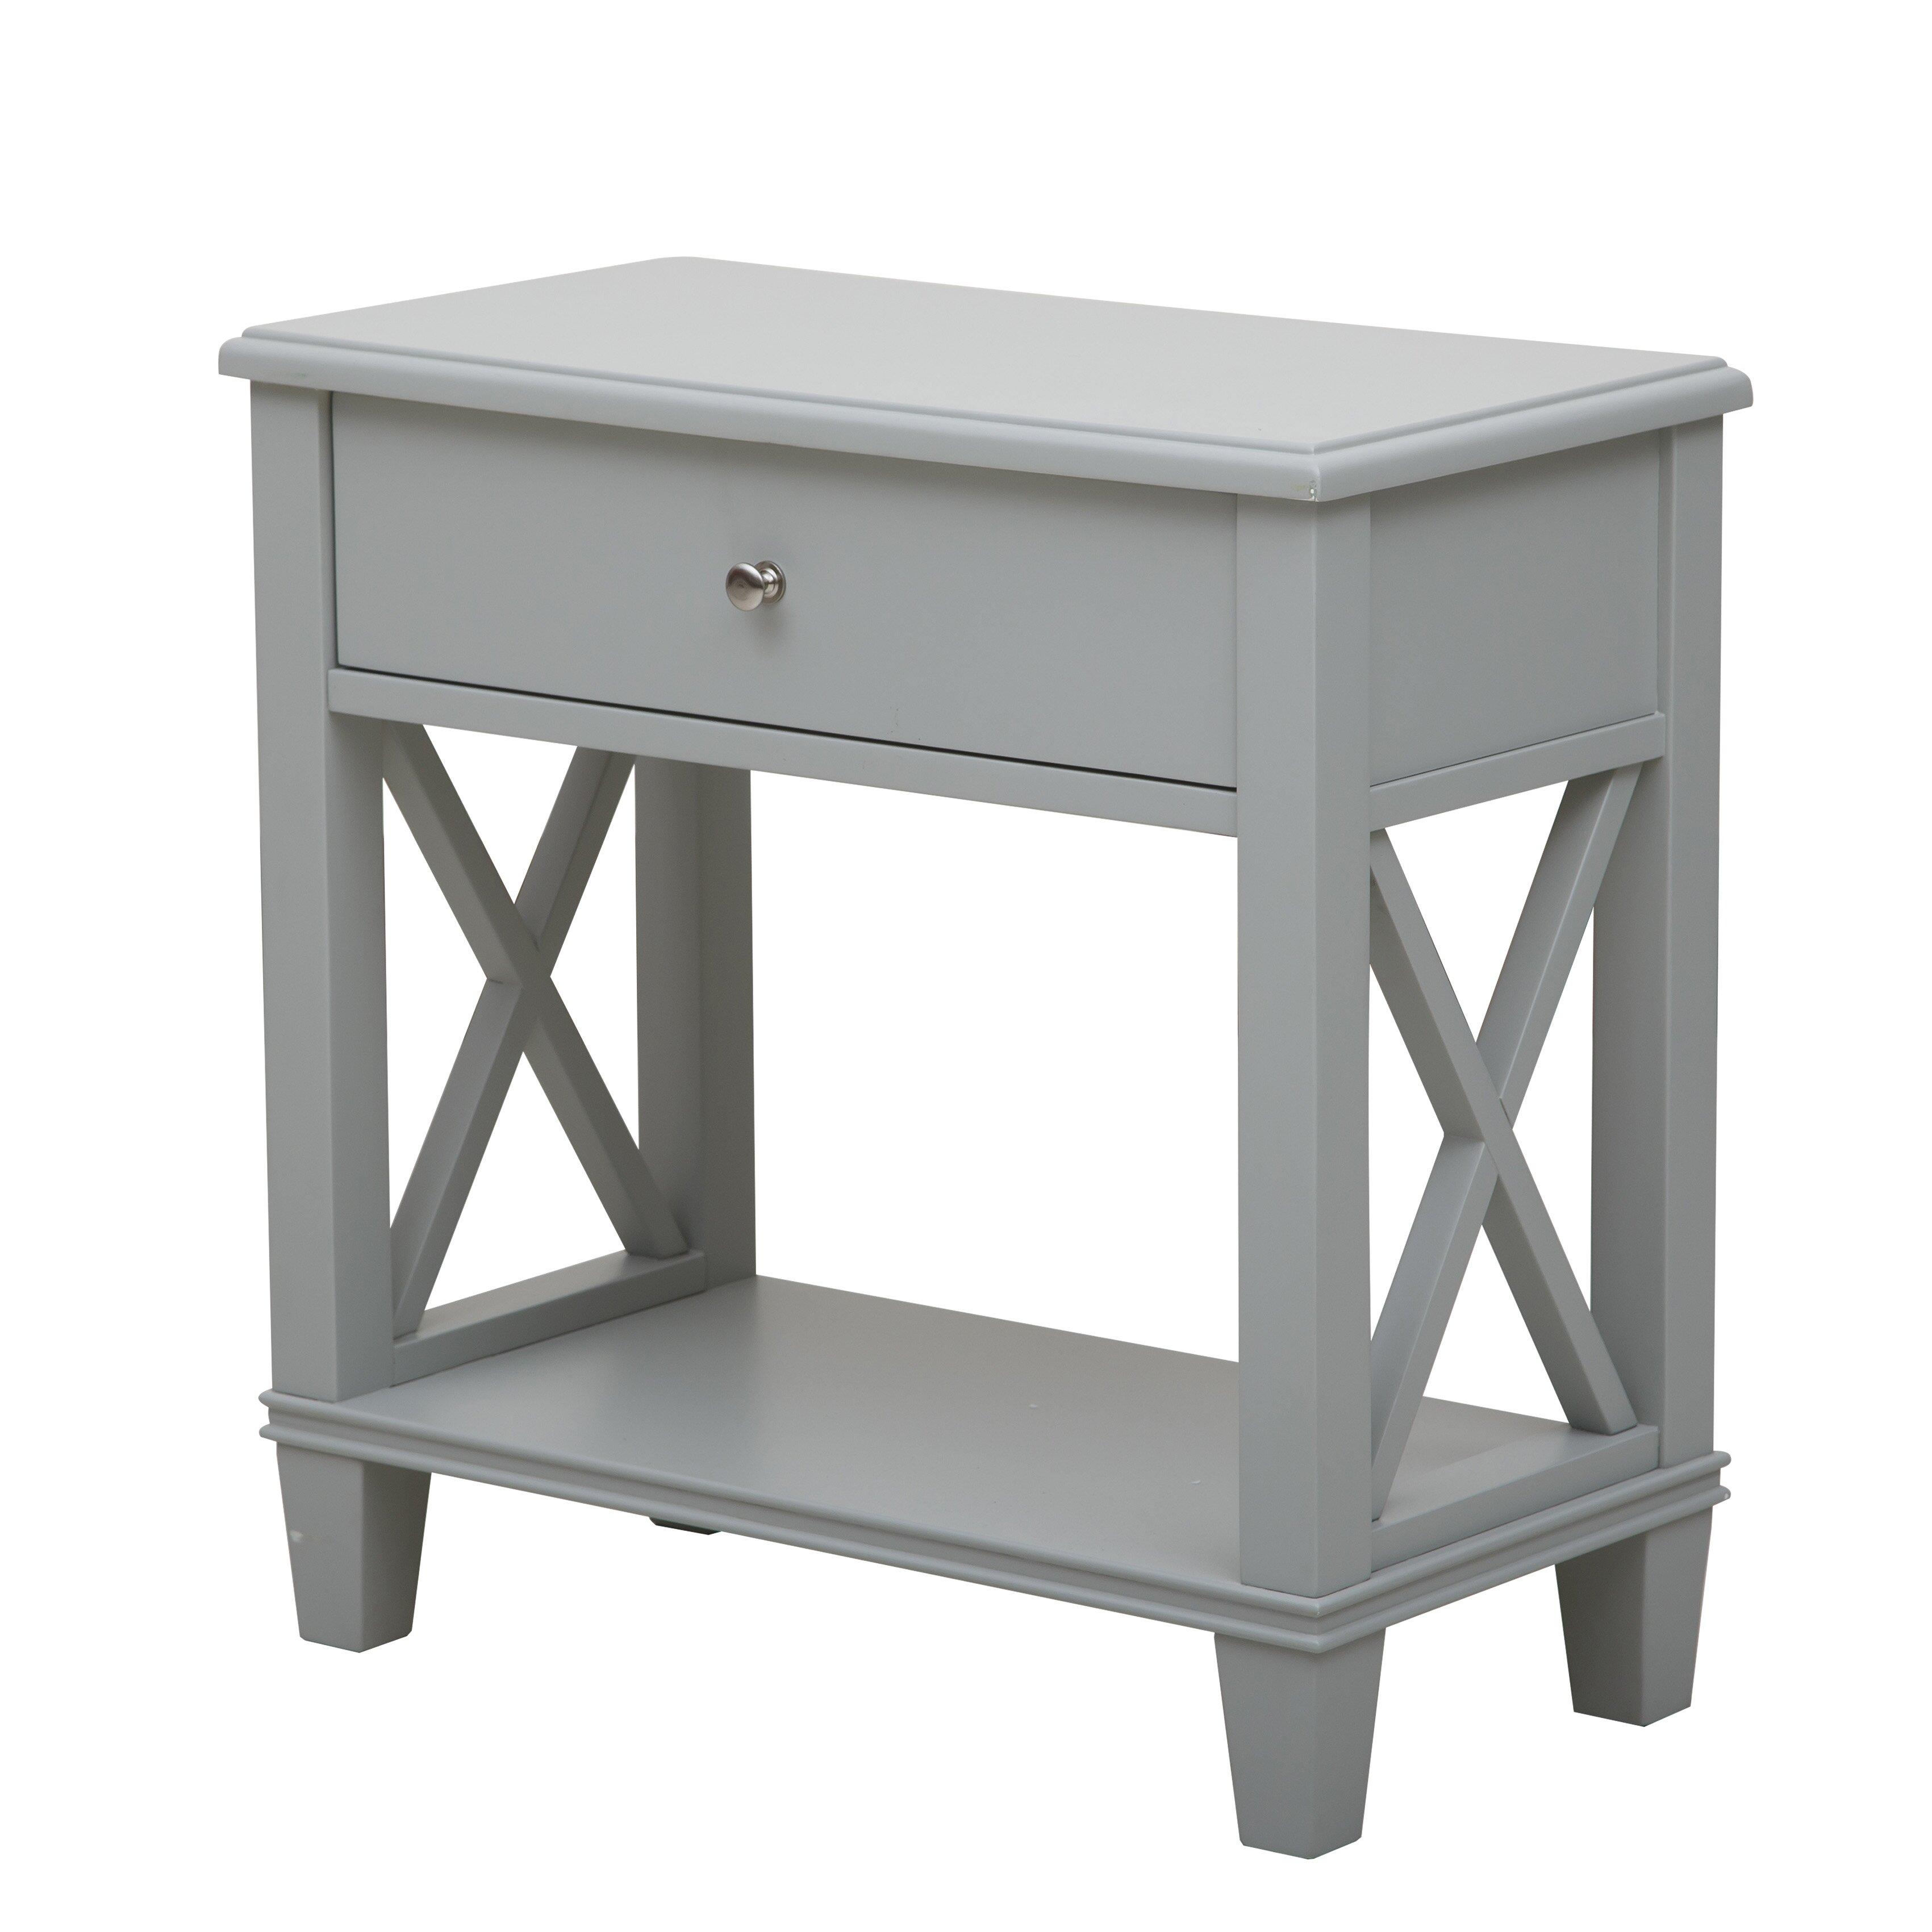 breakwater bay 1 drawer end table reviews wayfair. Black Bedroom Furniture Sets. Home Design Ideas